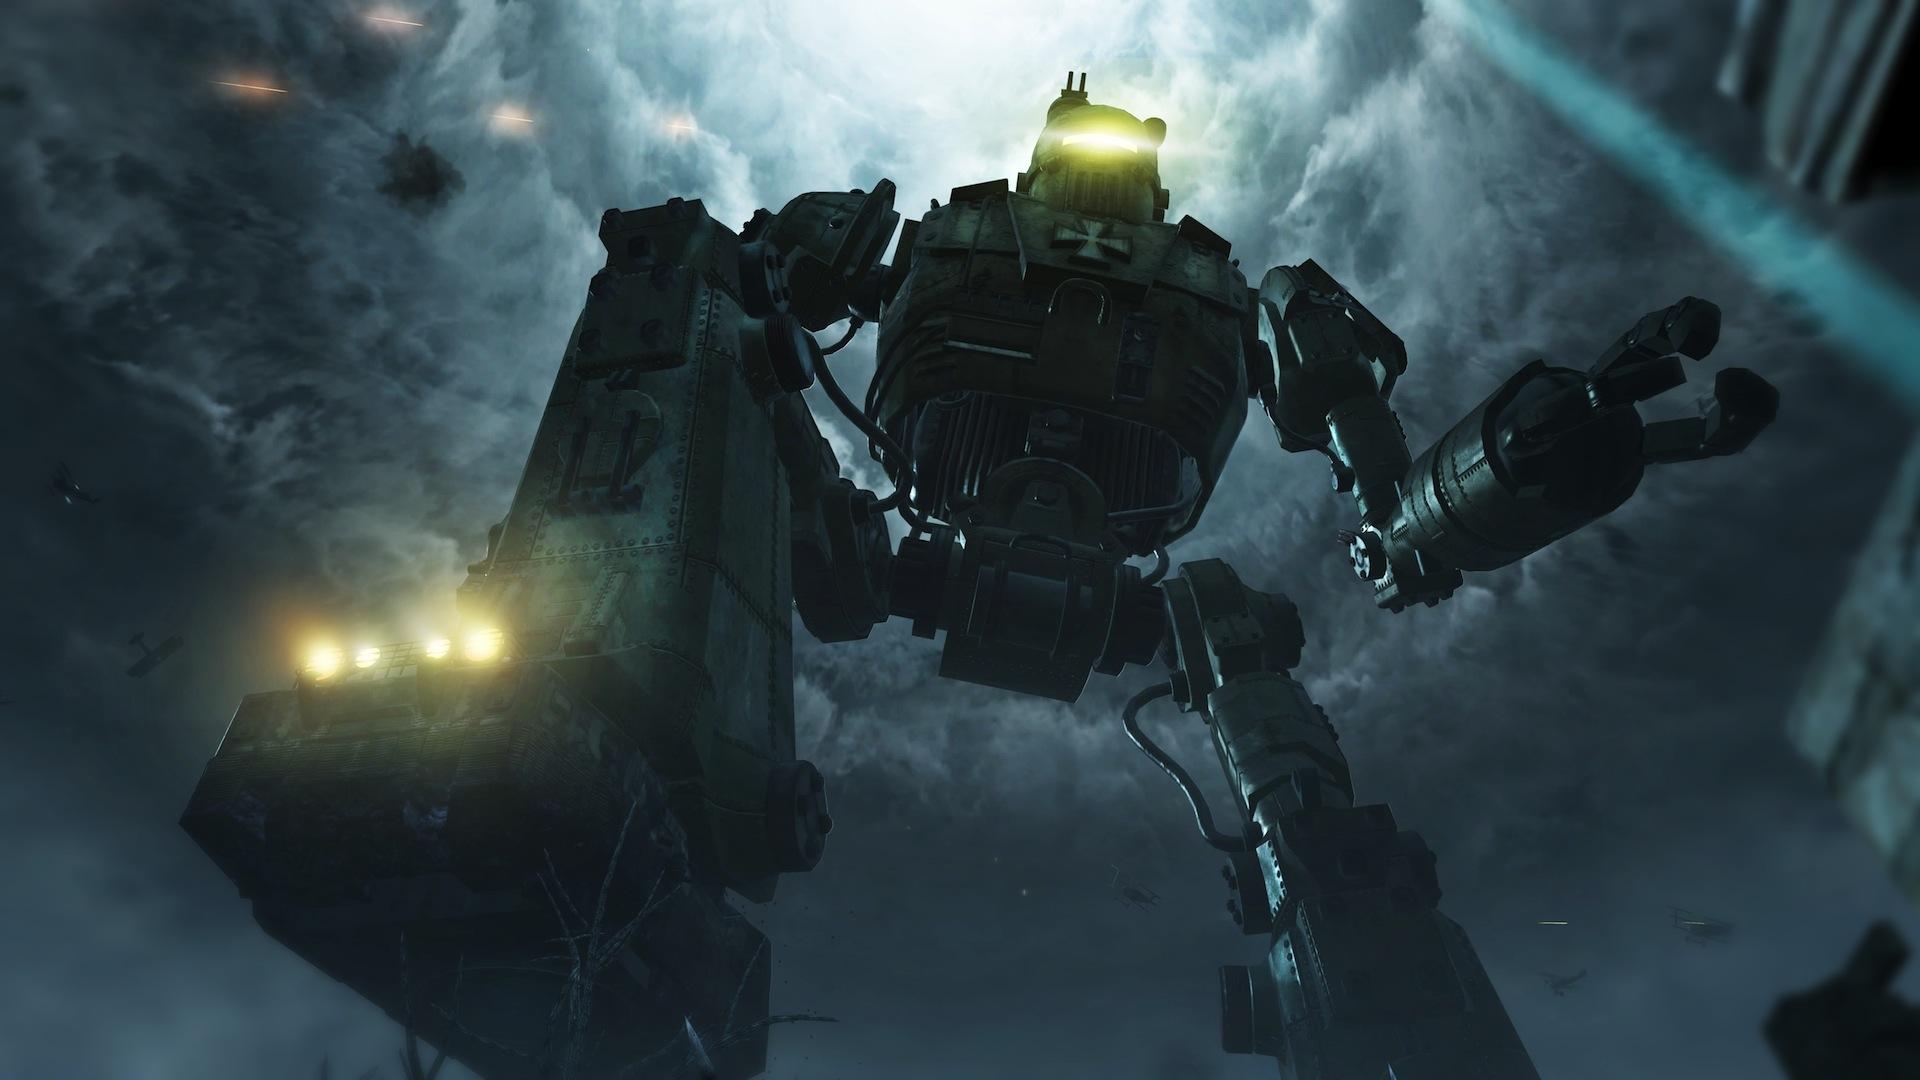 Giant Robot | Call of Duty Wiki | FANDOM powered by Wikia